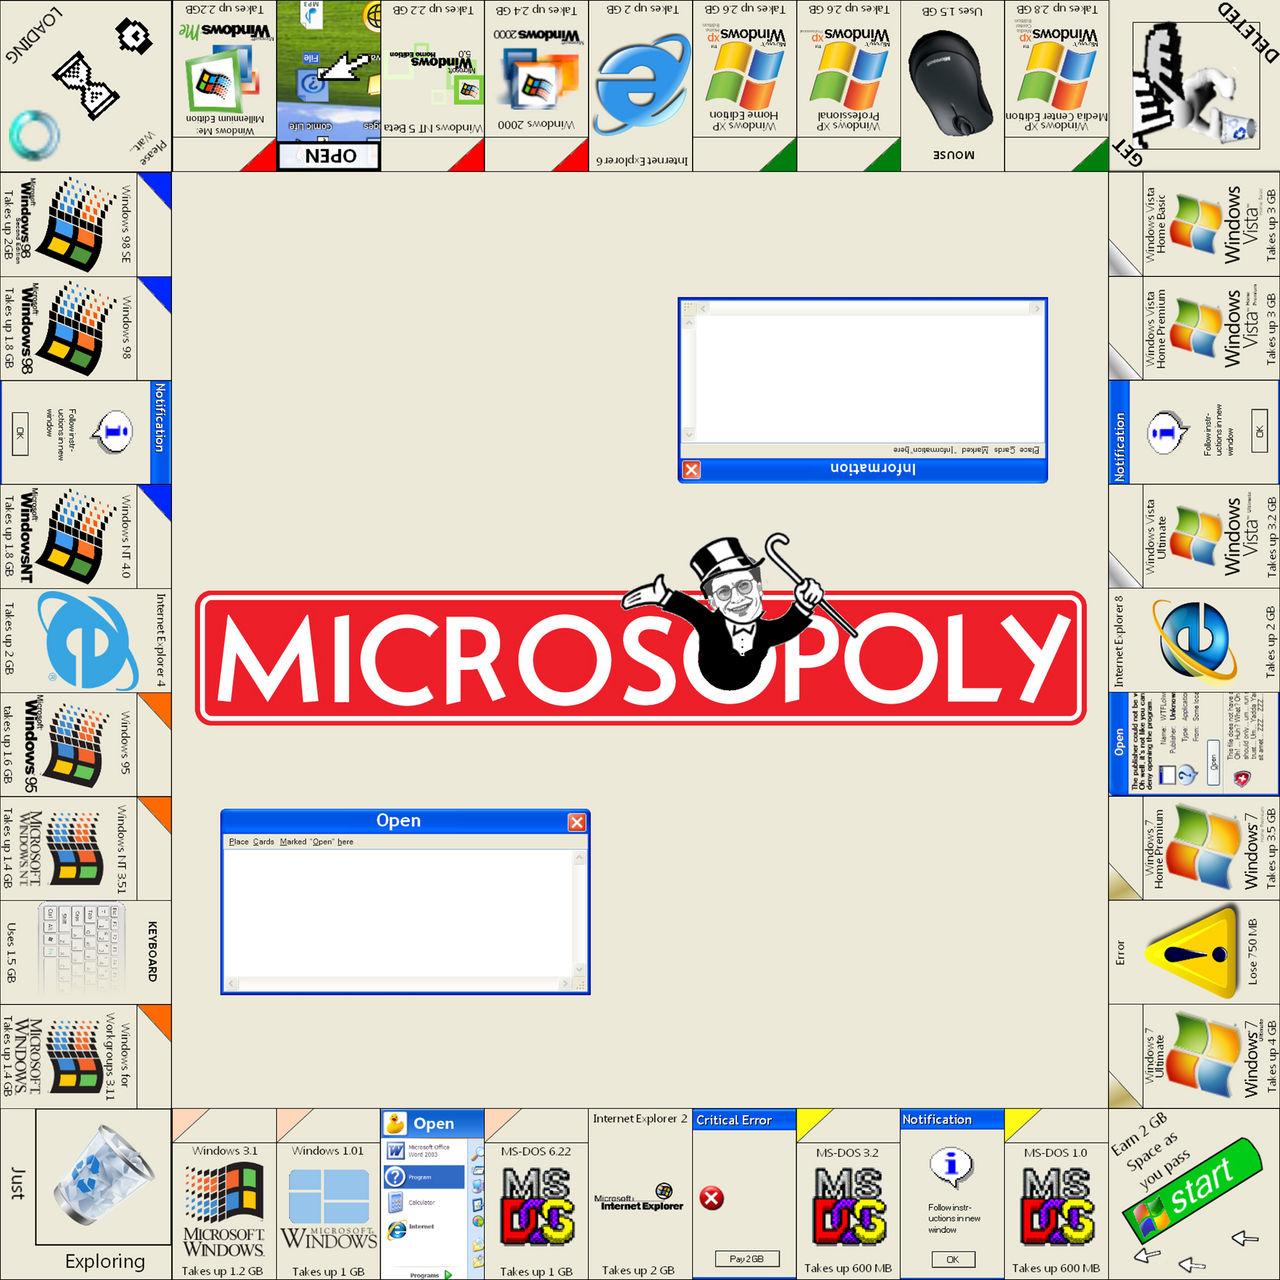 Microsoft Monopoly by jubjub449